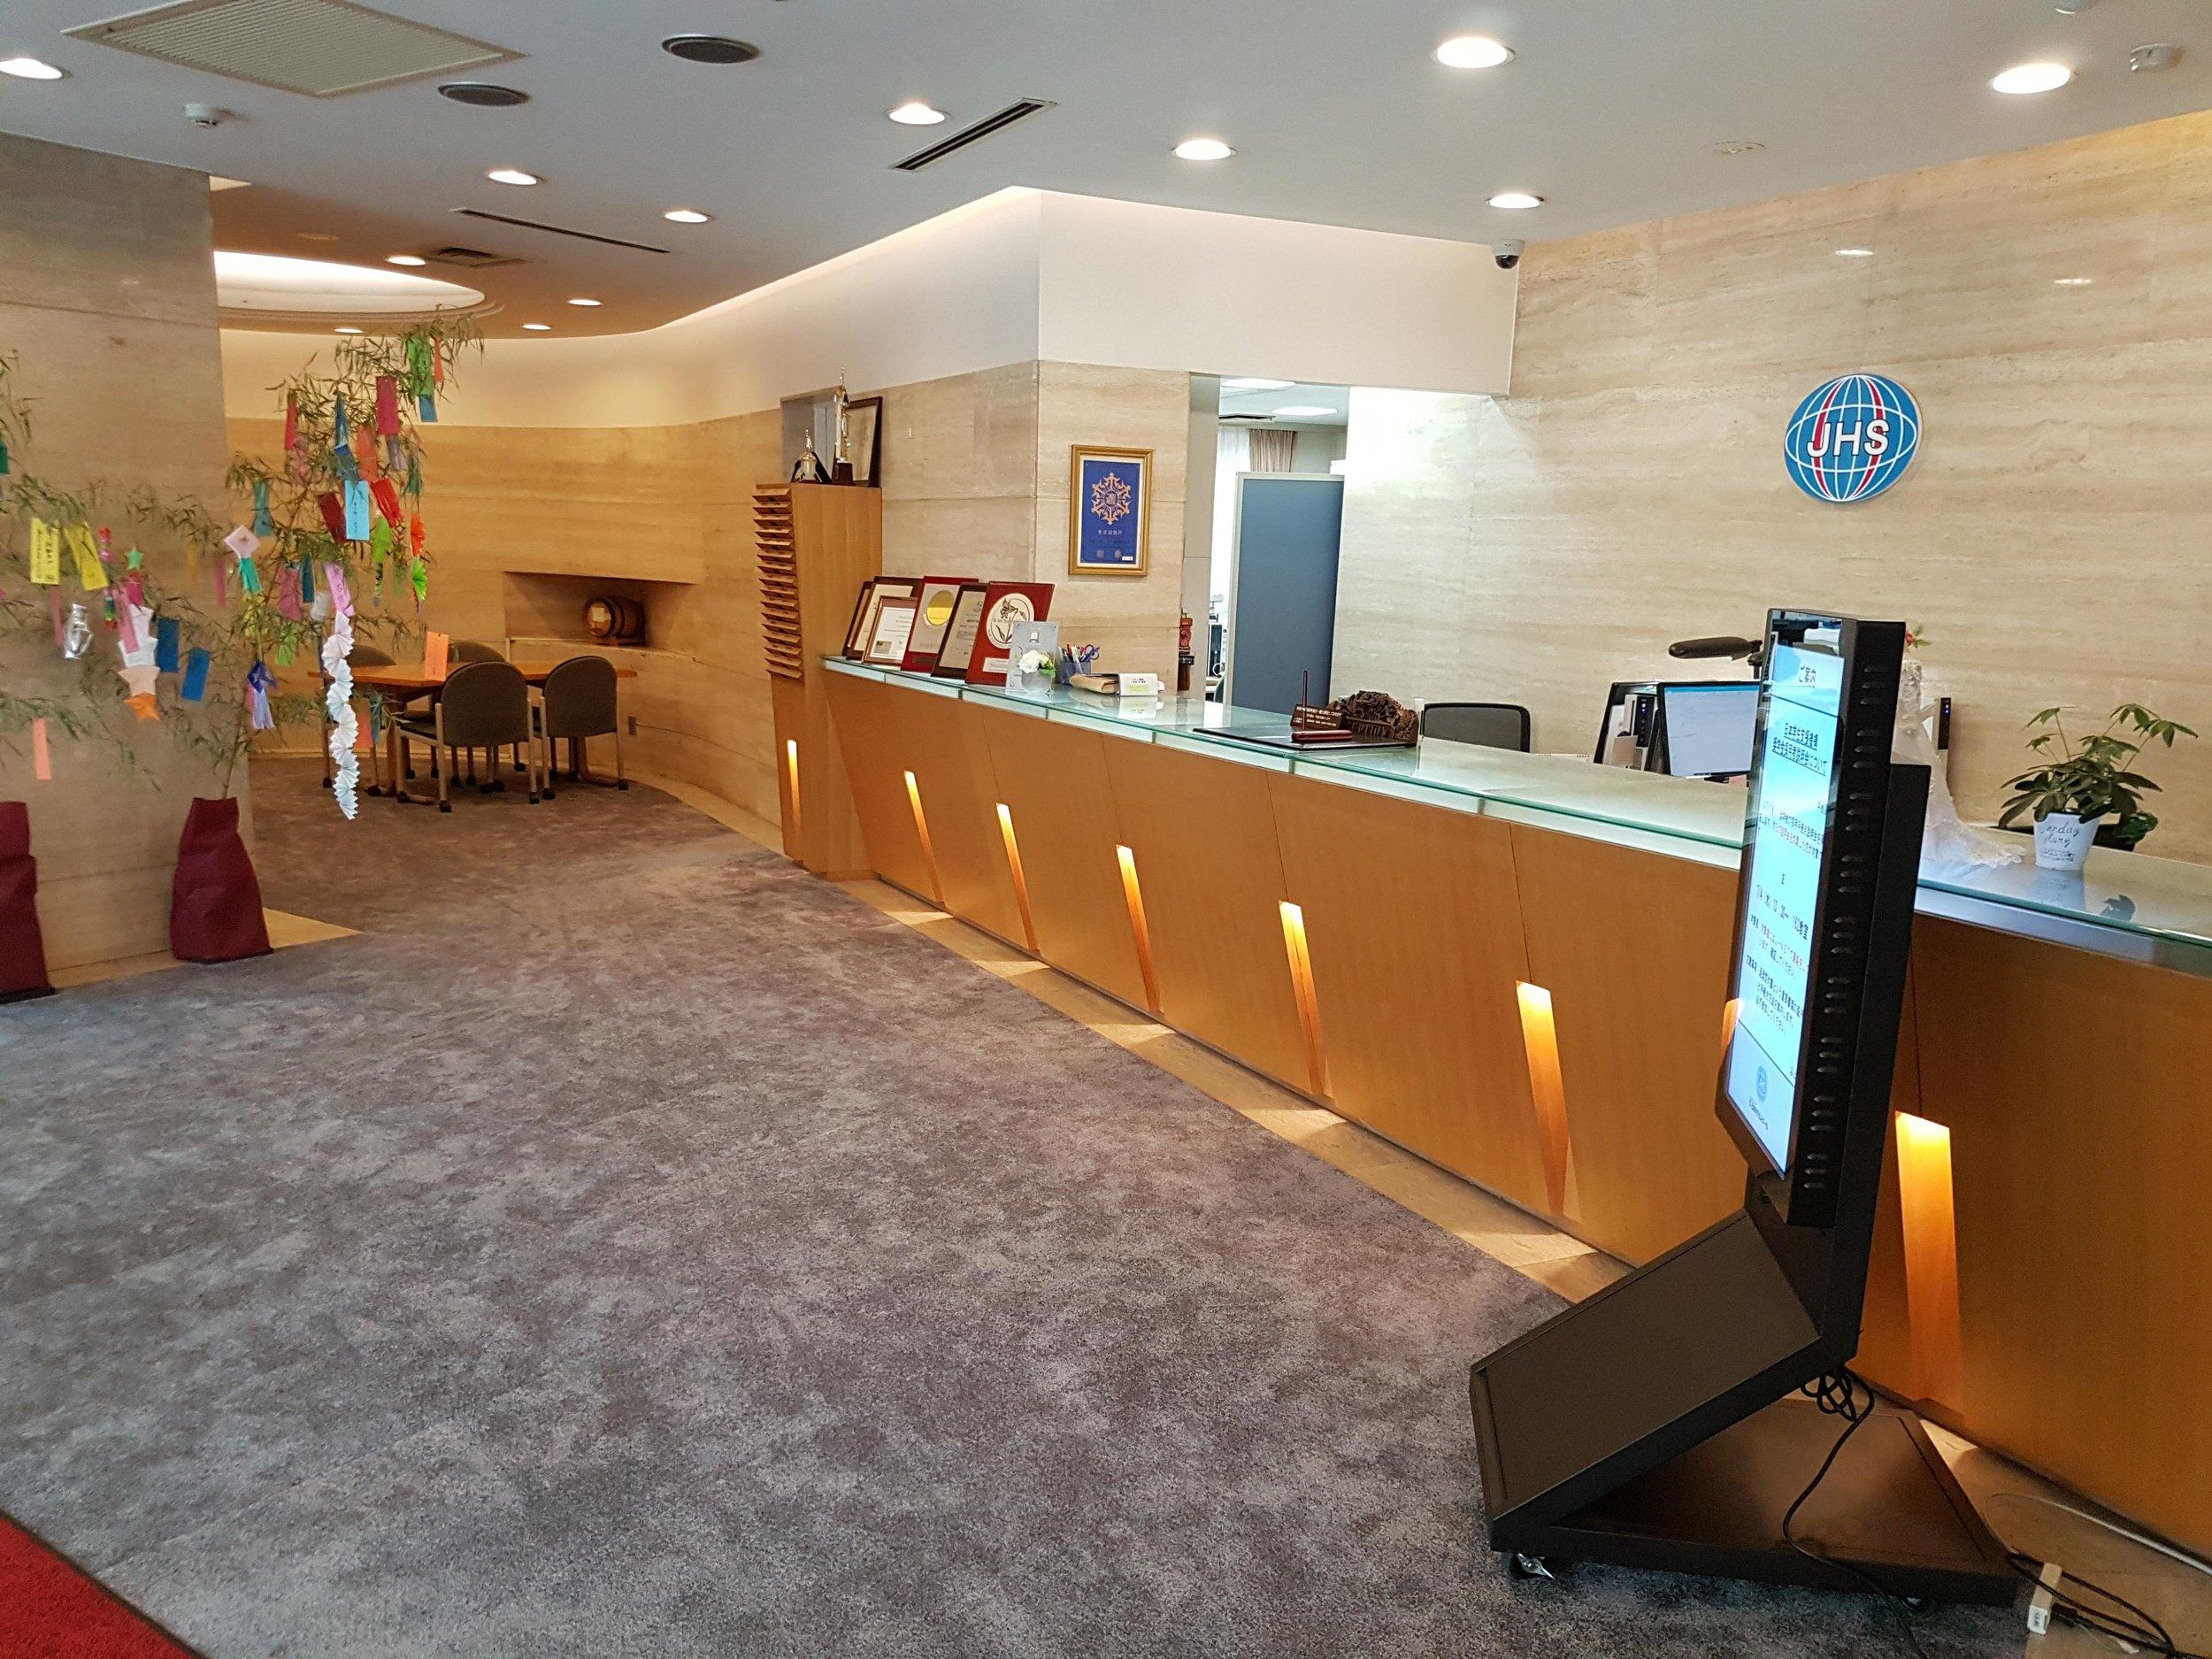 Tokyo Hotel School in Japan